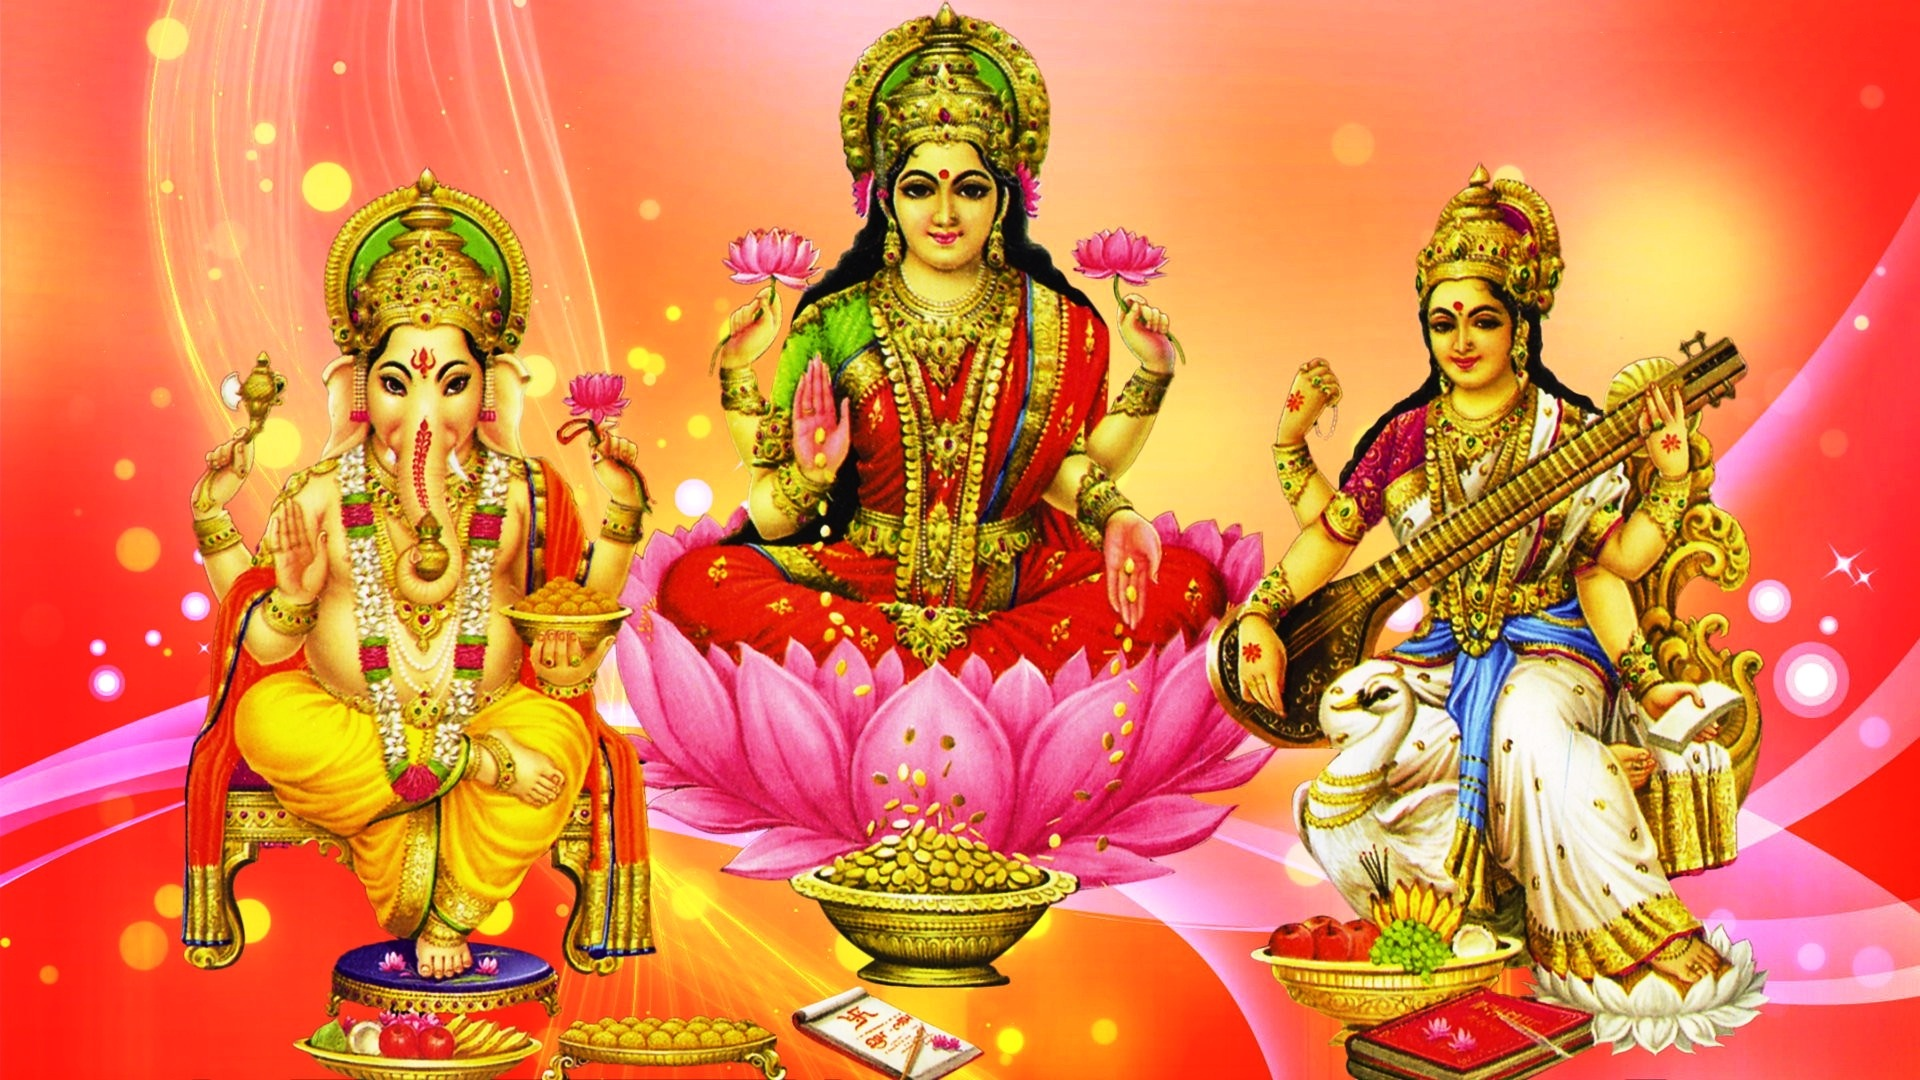 Laxmi Ganesh Saraswati Hd - HD Wallpaper